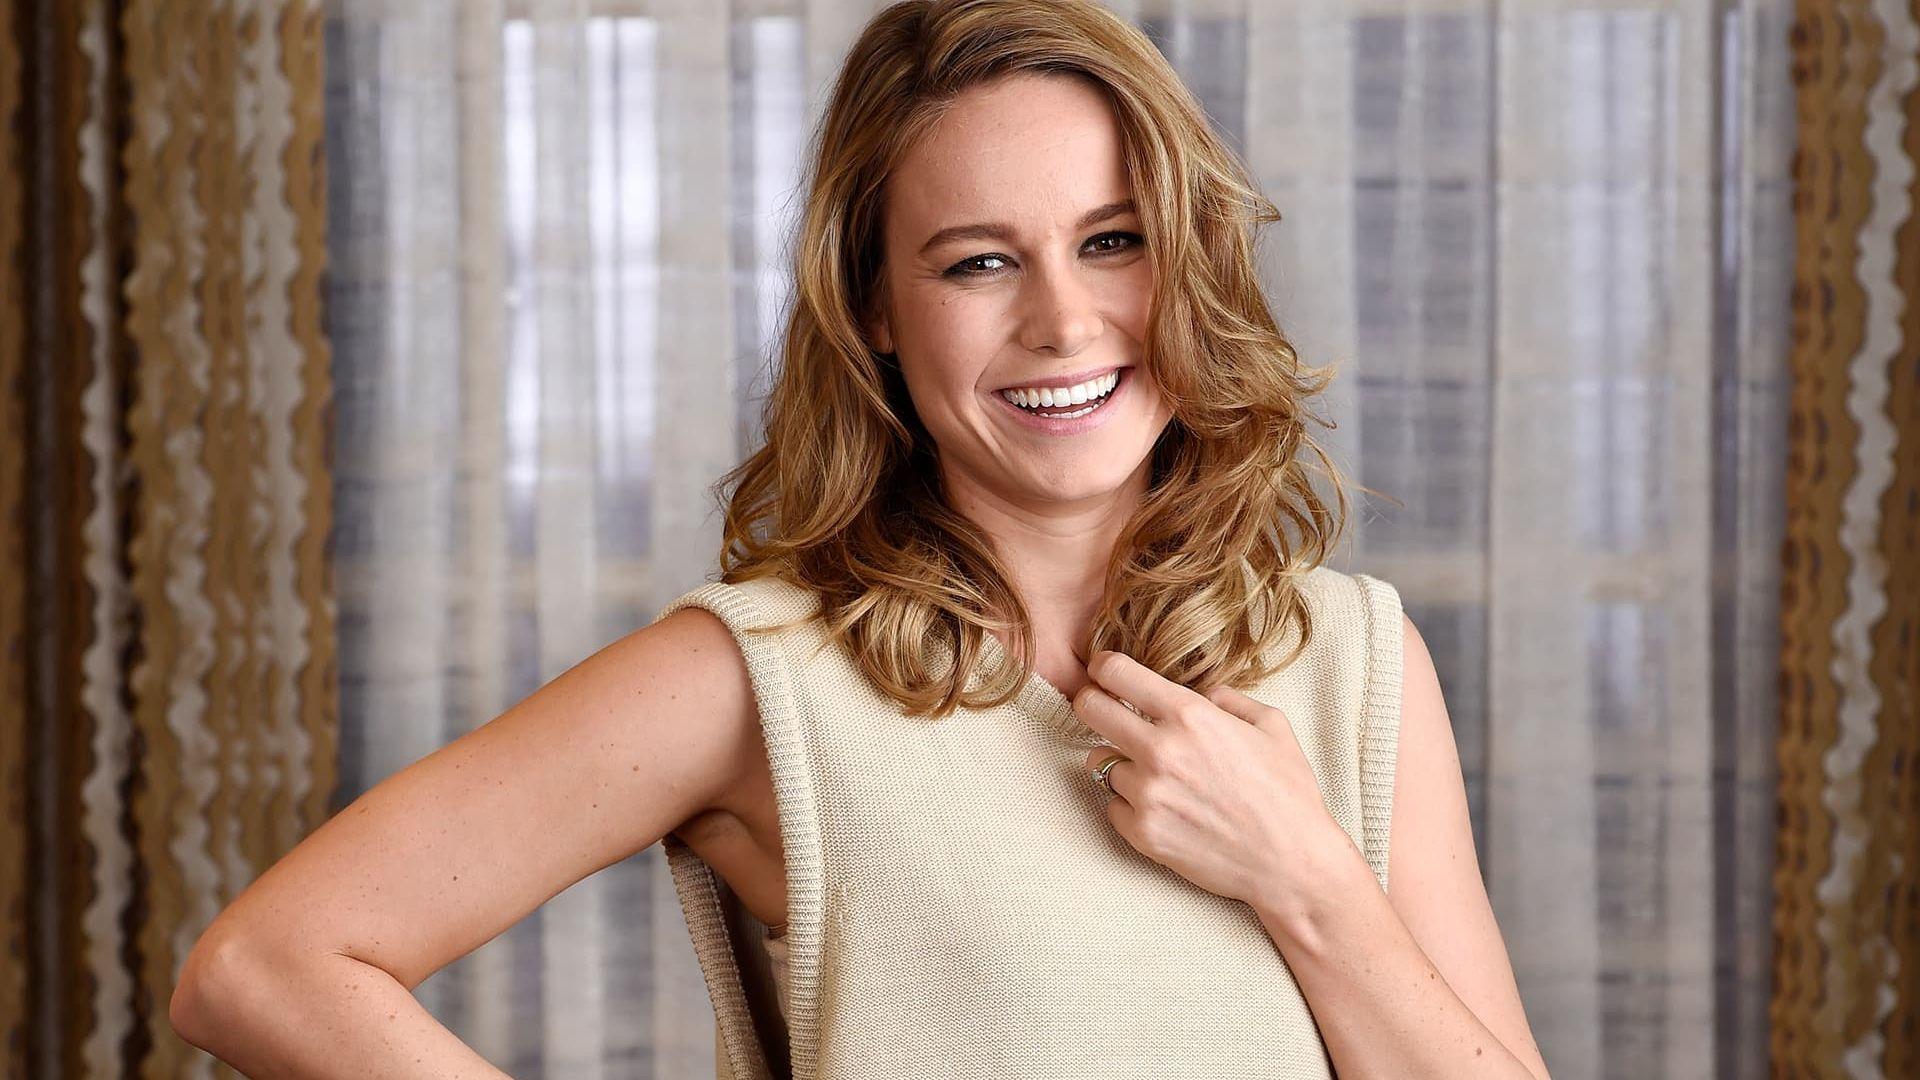 Wallpaper Blonde celebrity, Brie Larson, smile